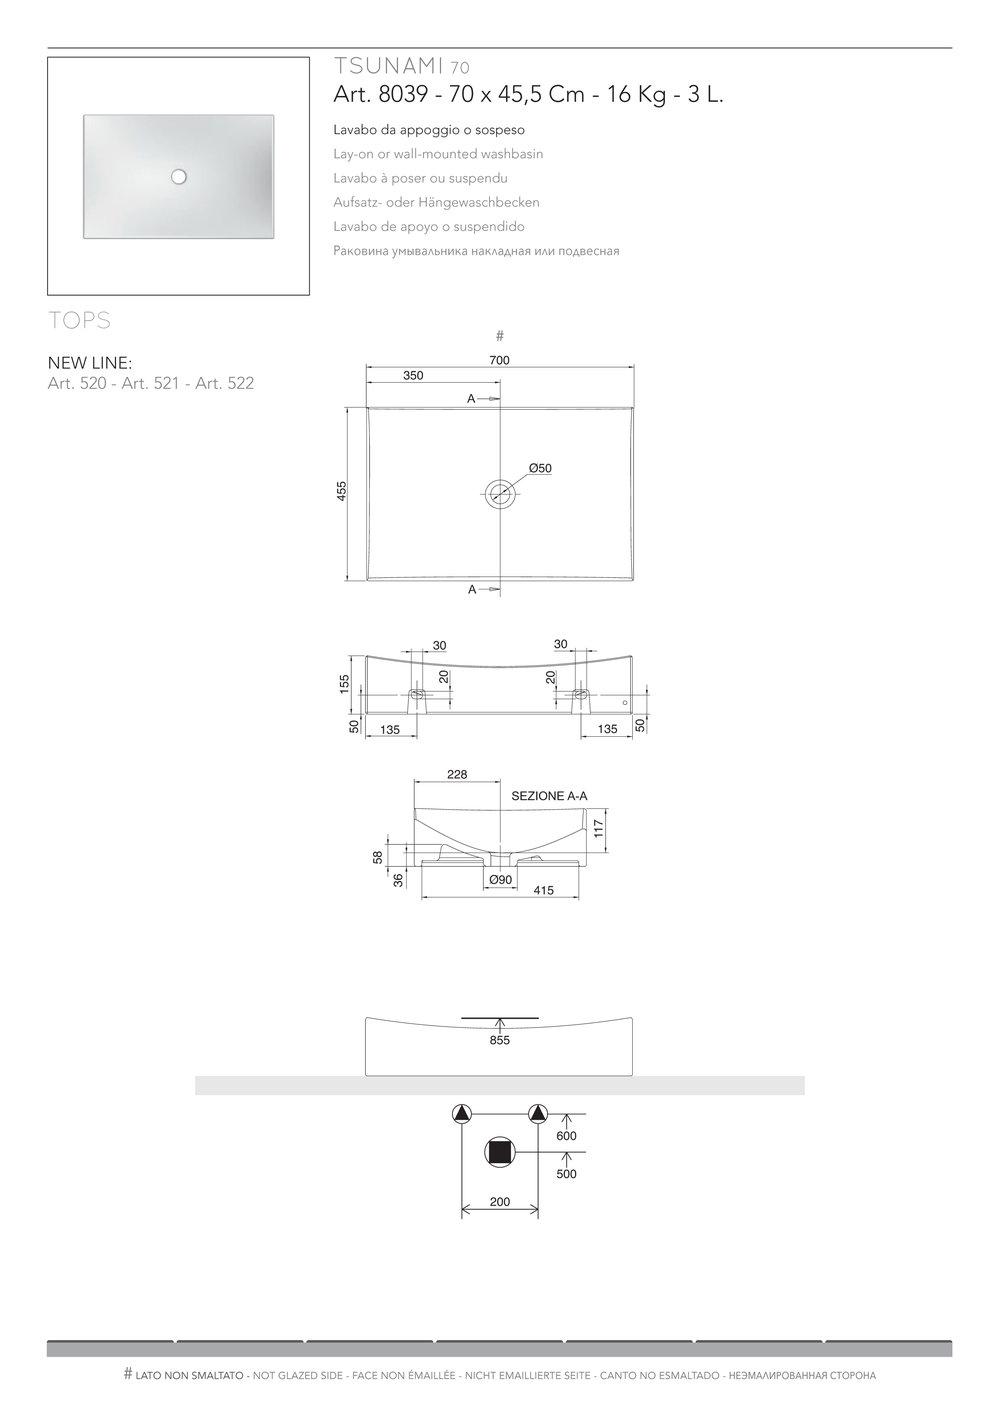 Scarbeo square basin, image 2, 18,1 2 x 18 x 5,5cm high.jpg